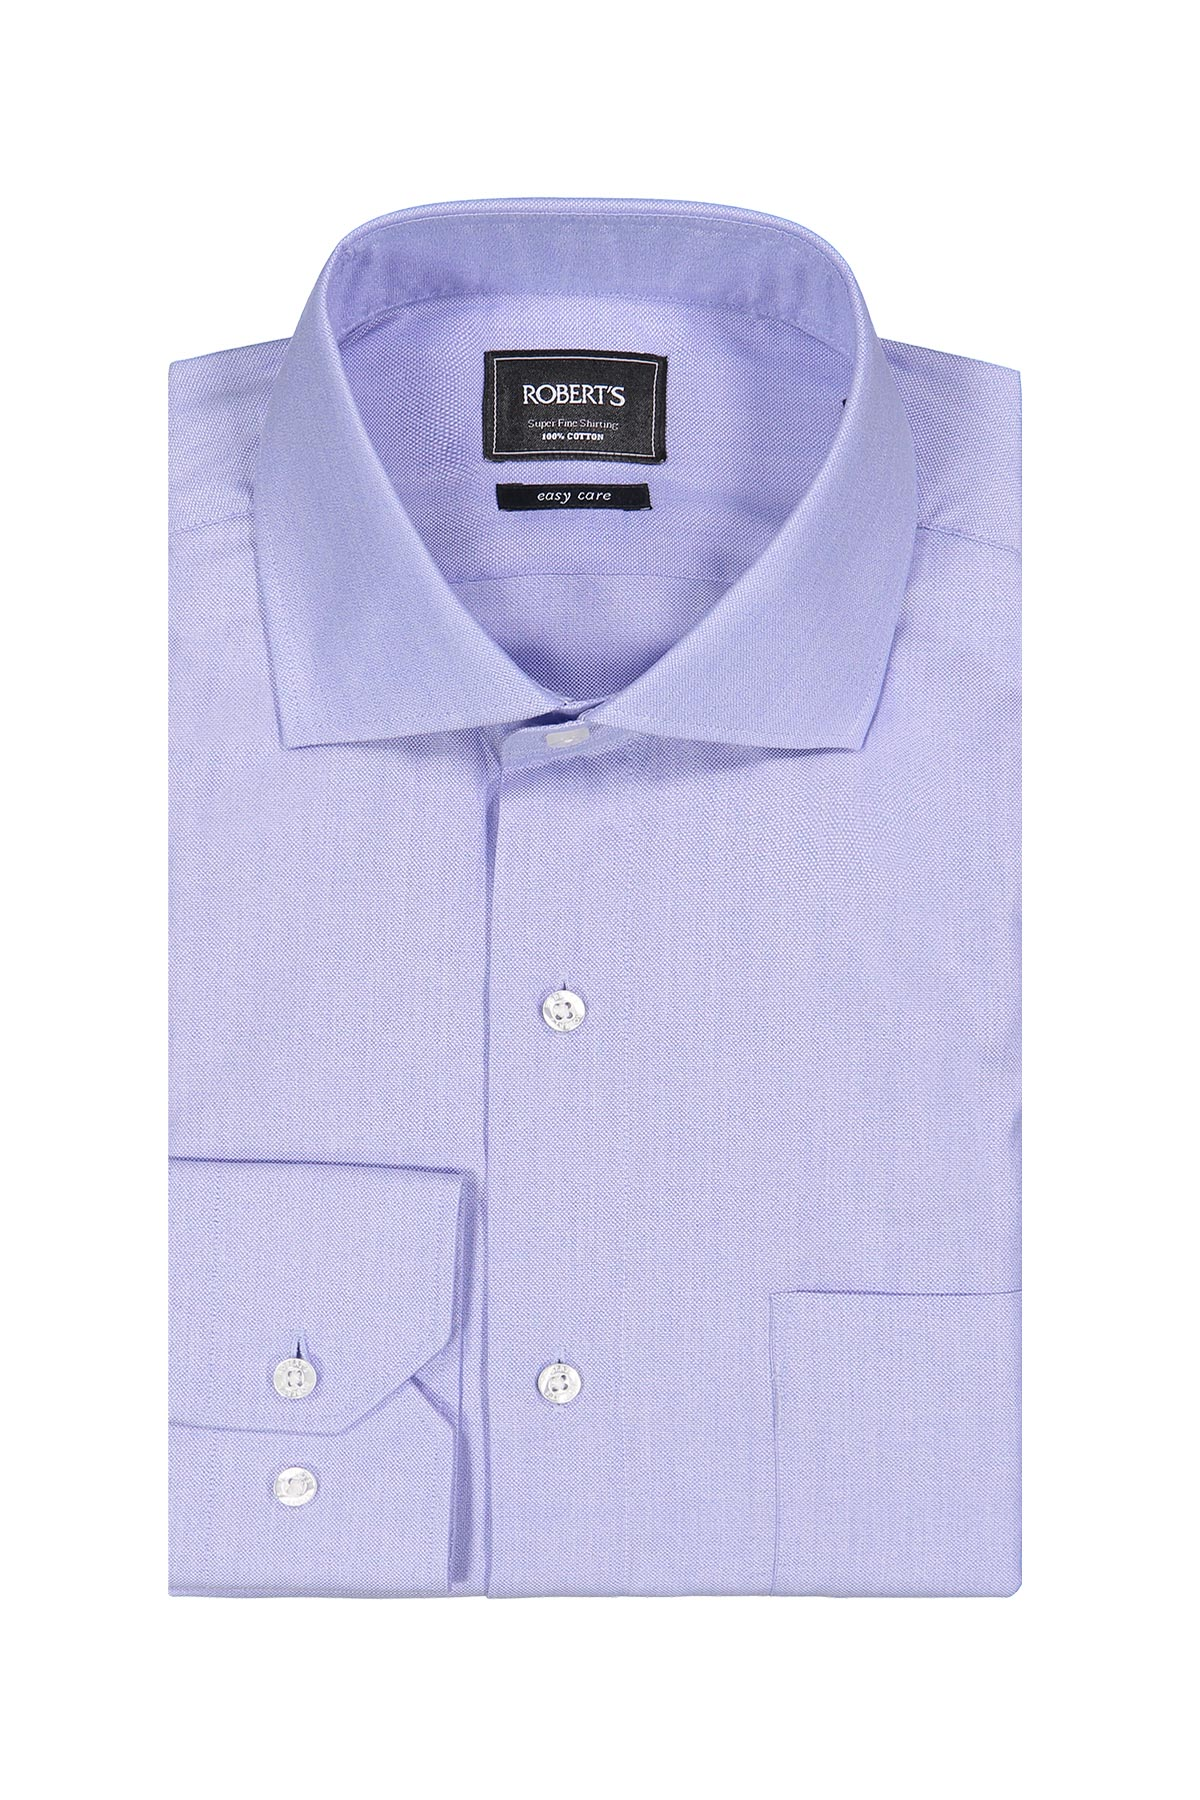 Camisa Robert´s, Easy Care, celeste lisa, cuello italiano, puño simple.